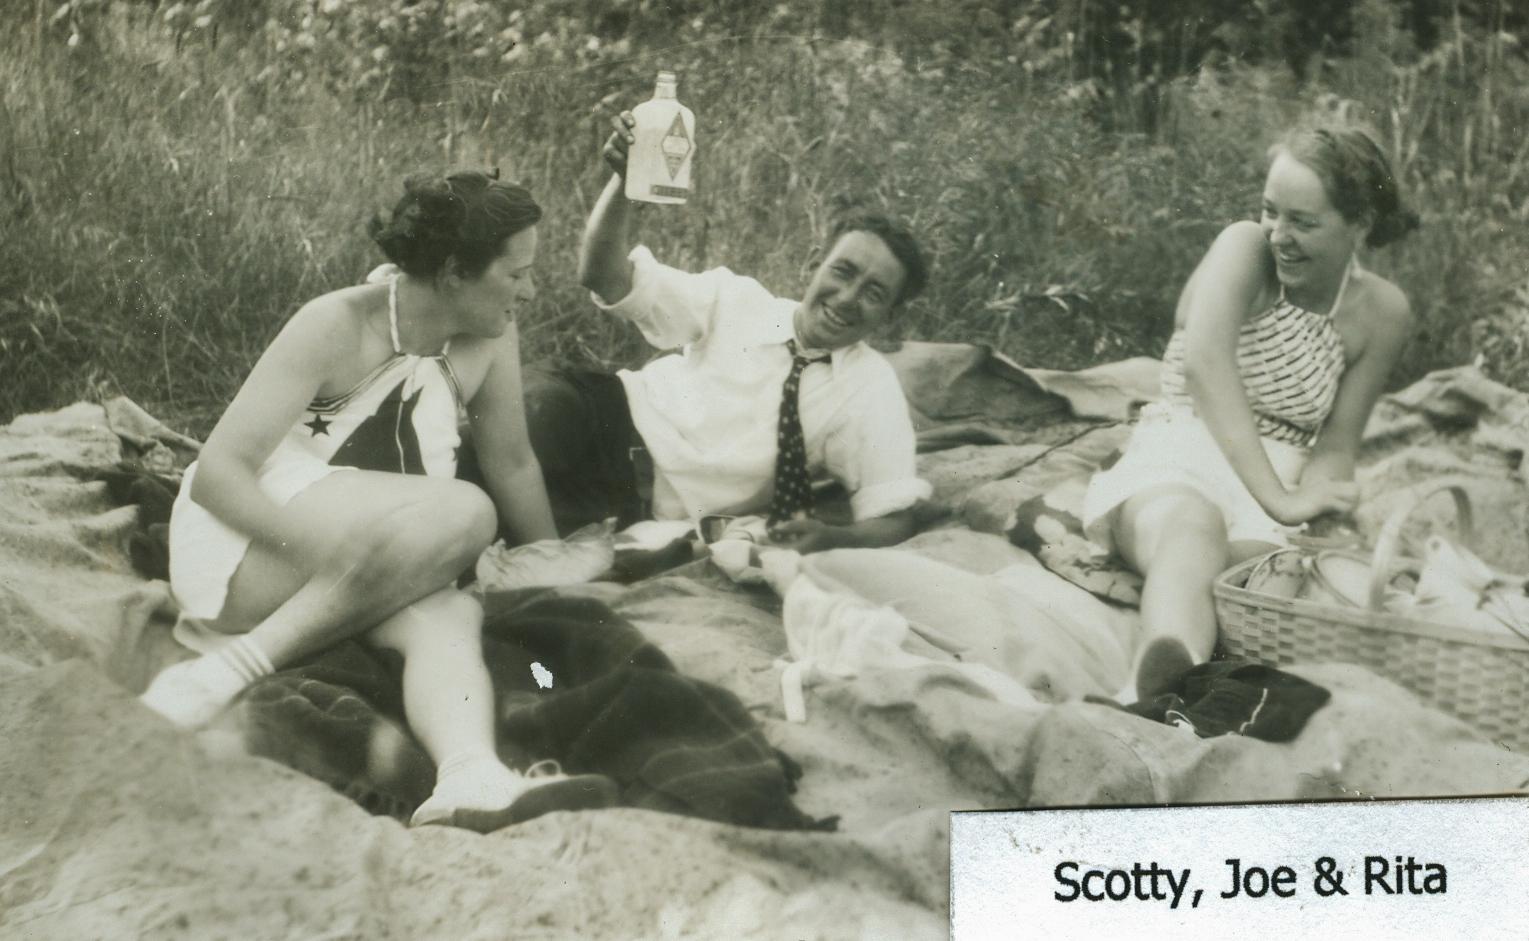 Scotty, Joe & Rita, Crowe Lake, Marmora